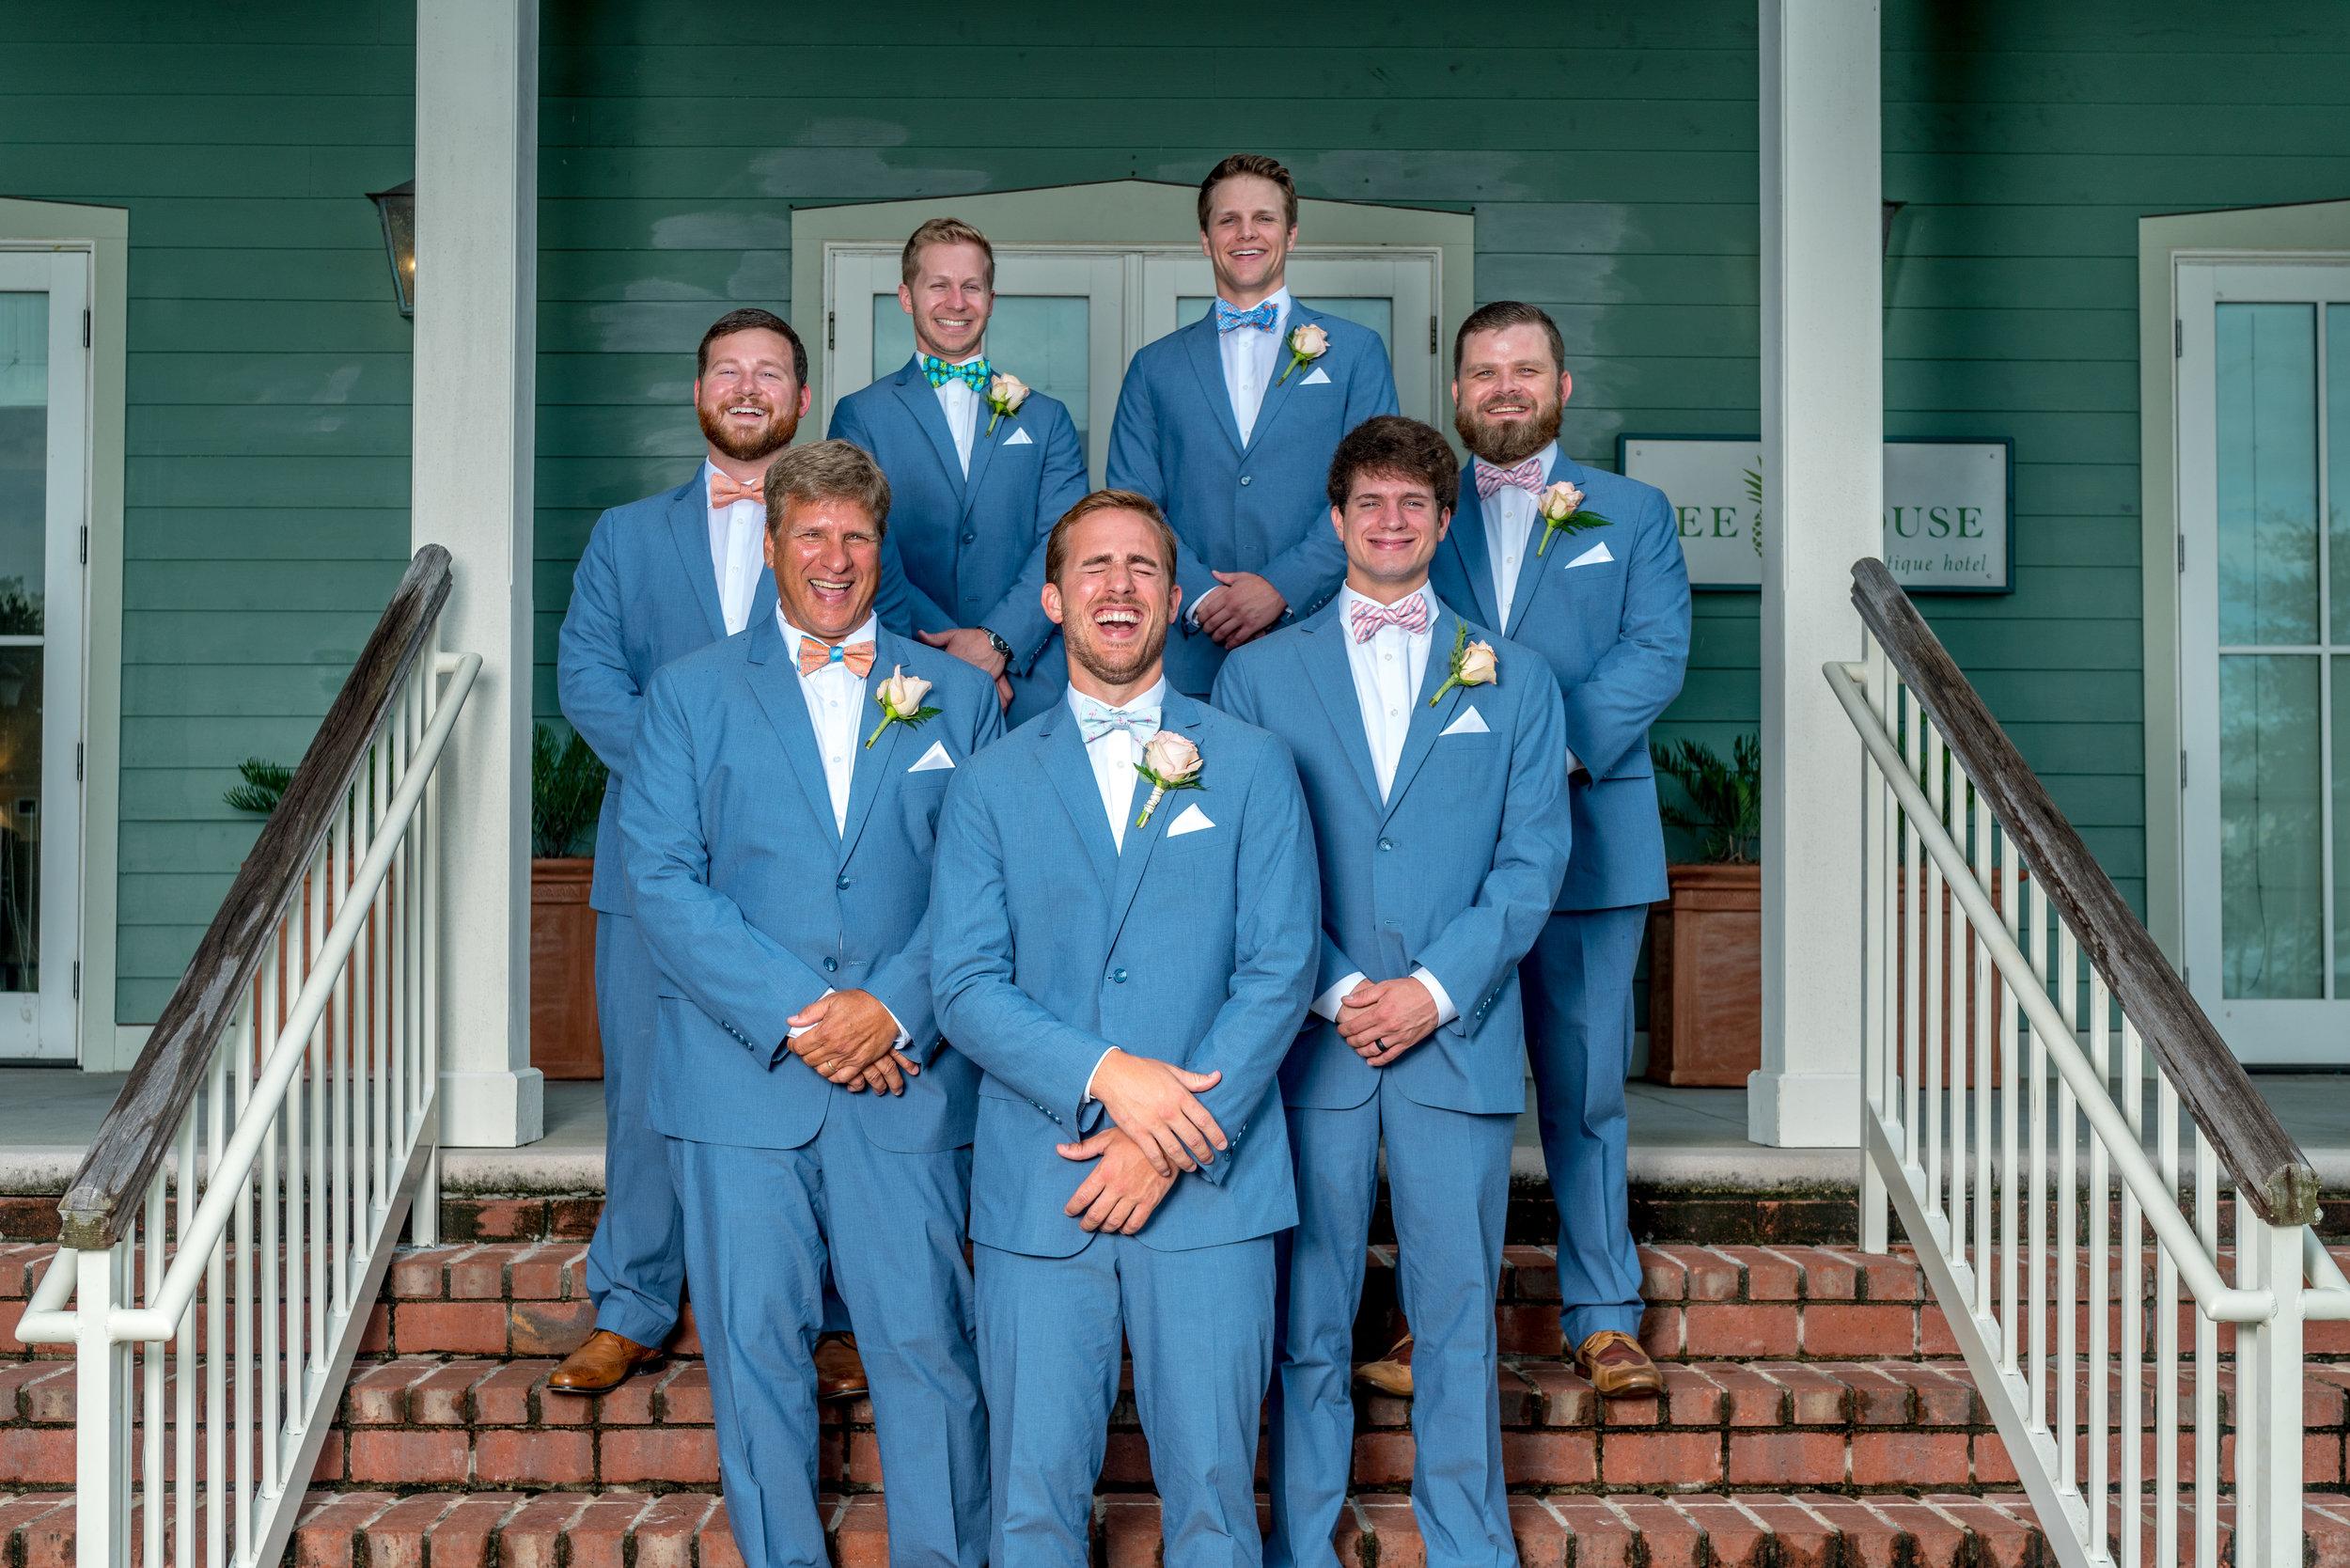 groomsmen-tuxedos-wedding.jpg